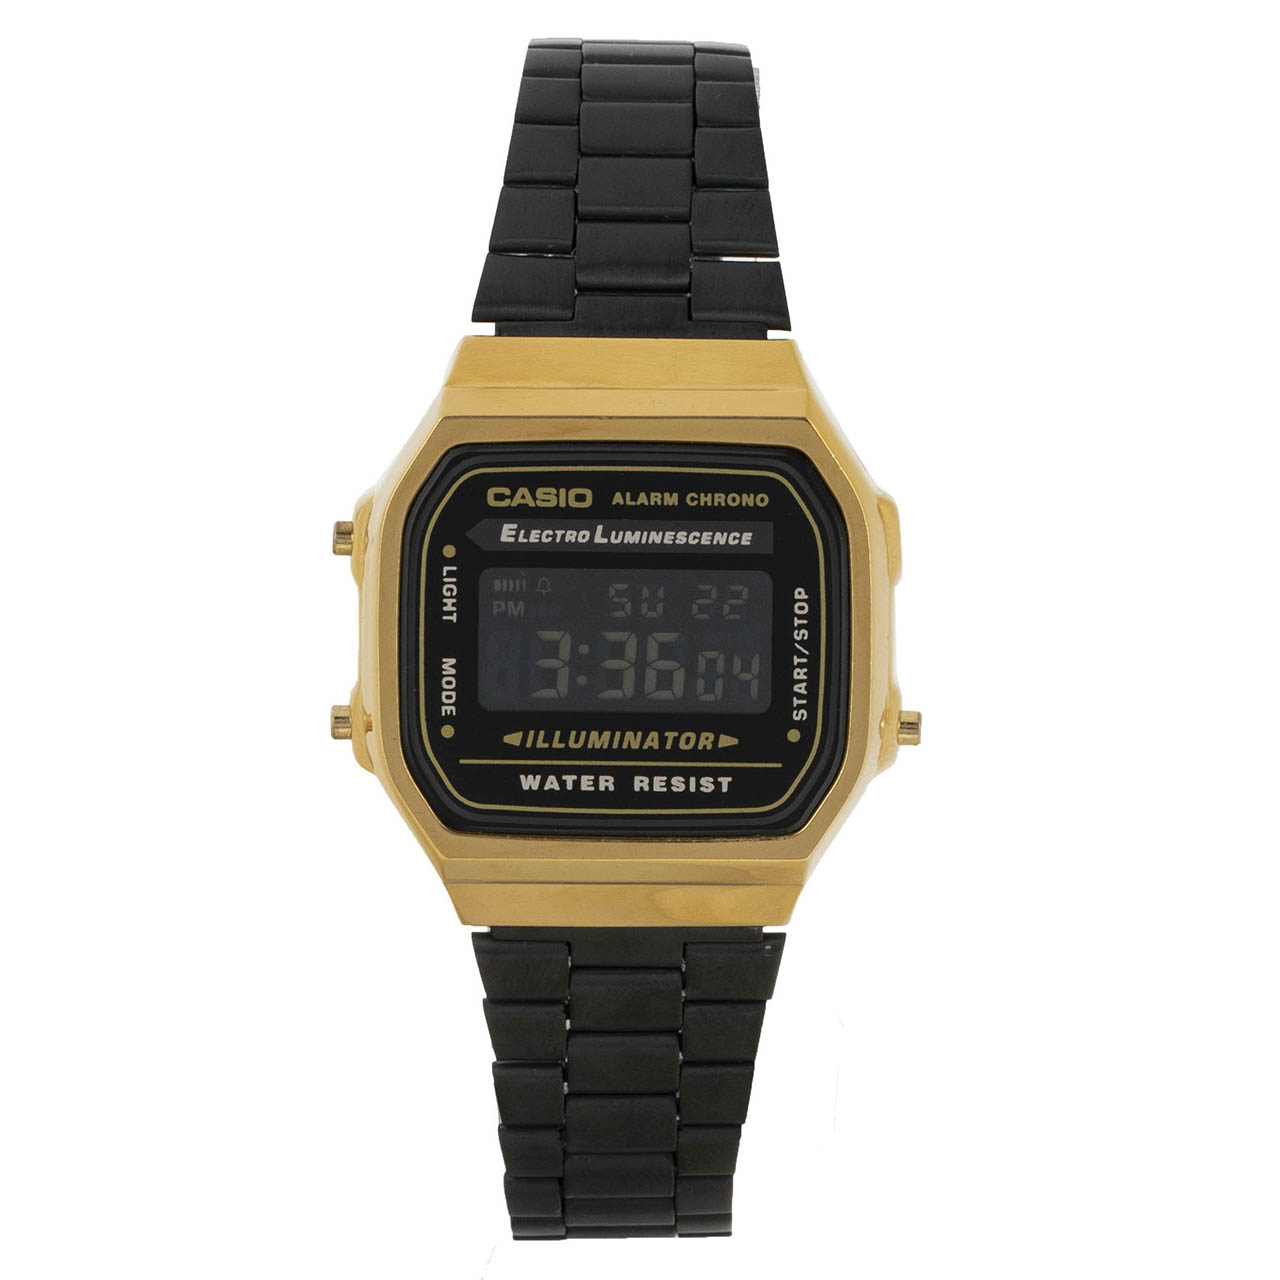 ساعت مچی دیجیتالی کاسیو مدل A168WEGB-1BDF 49